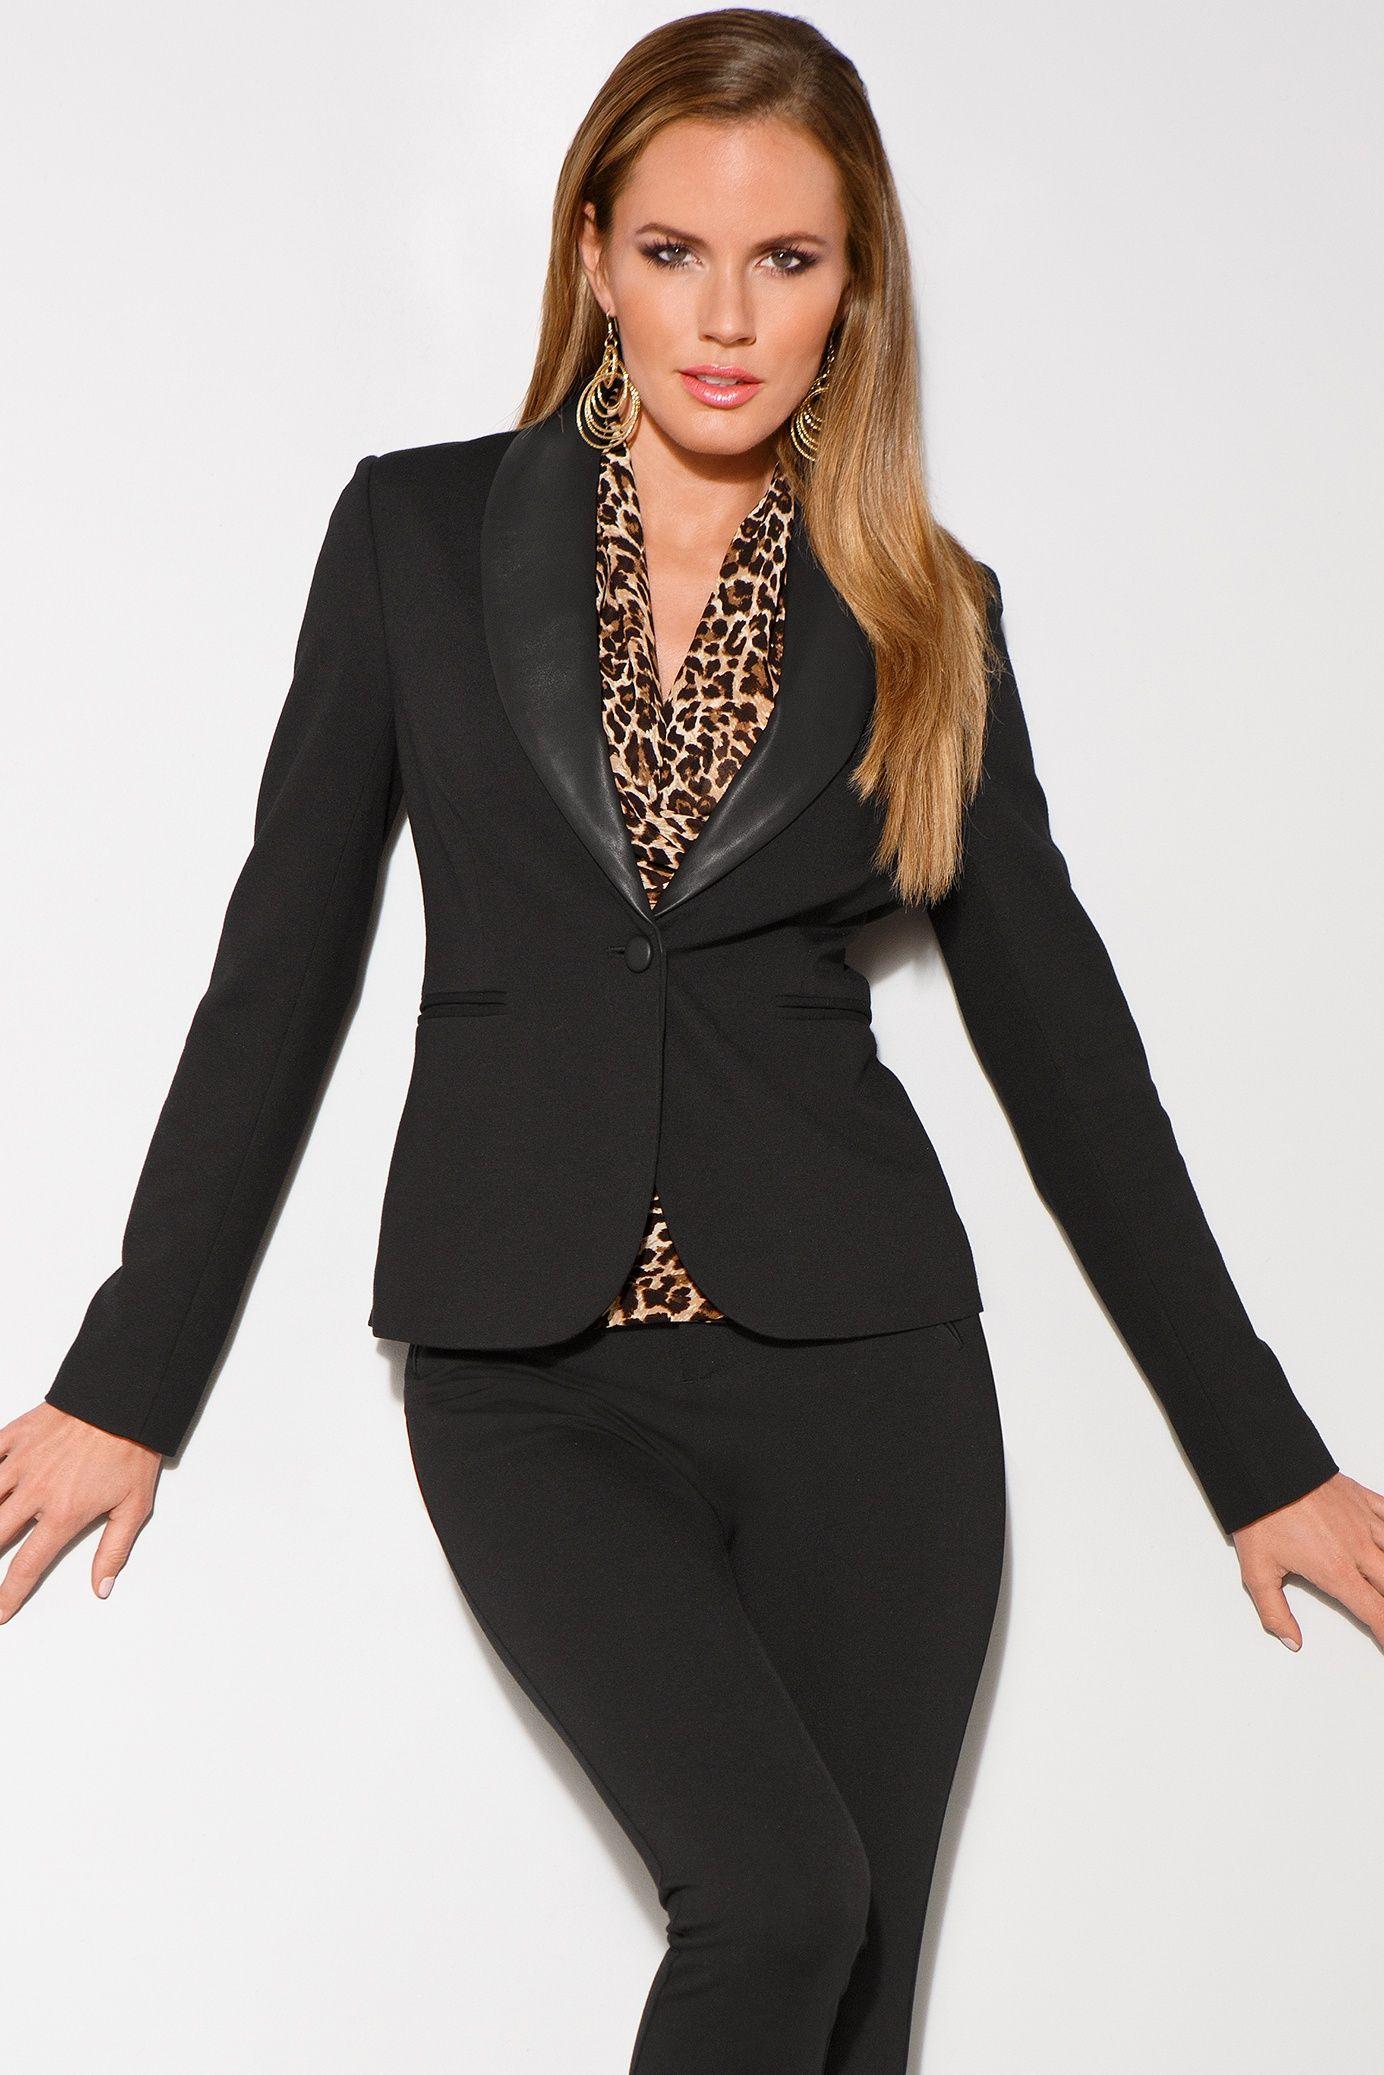 3db32c549b Jackets for Women - Shop Ladies Jackets - Boston Proper ...